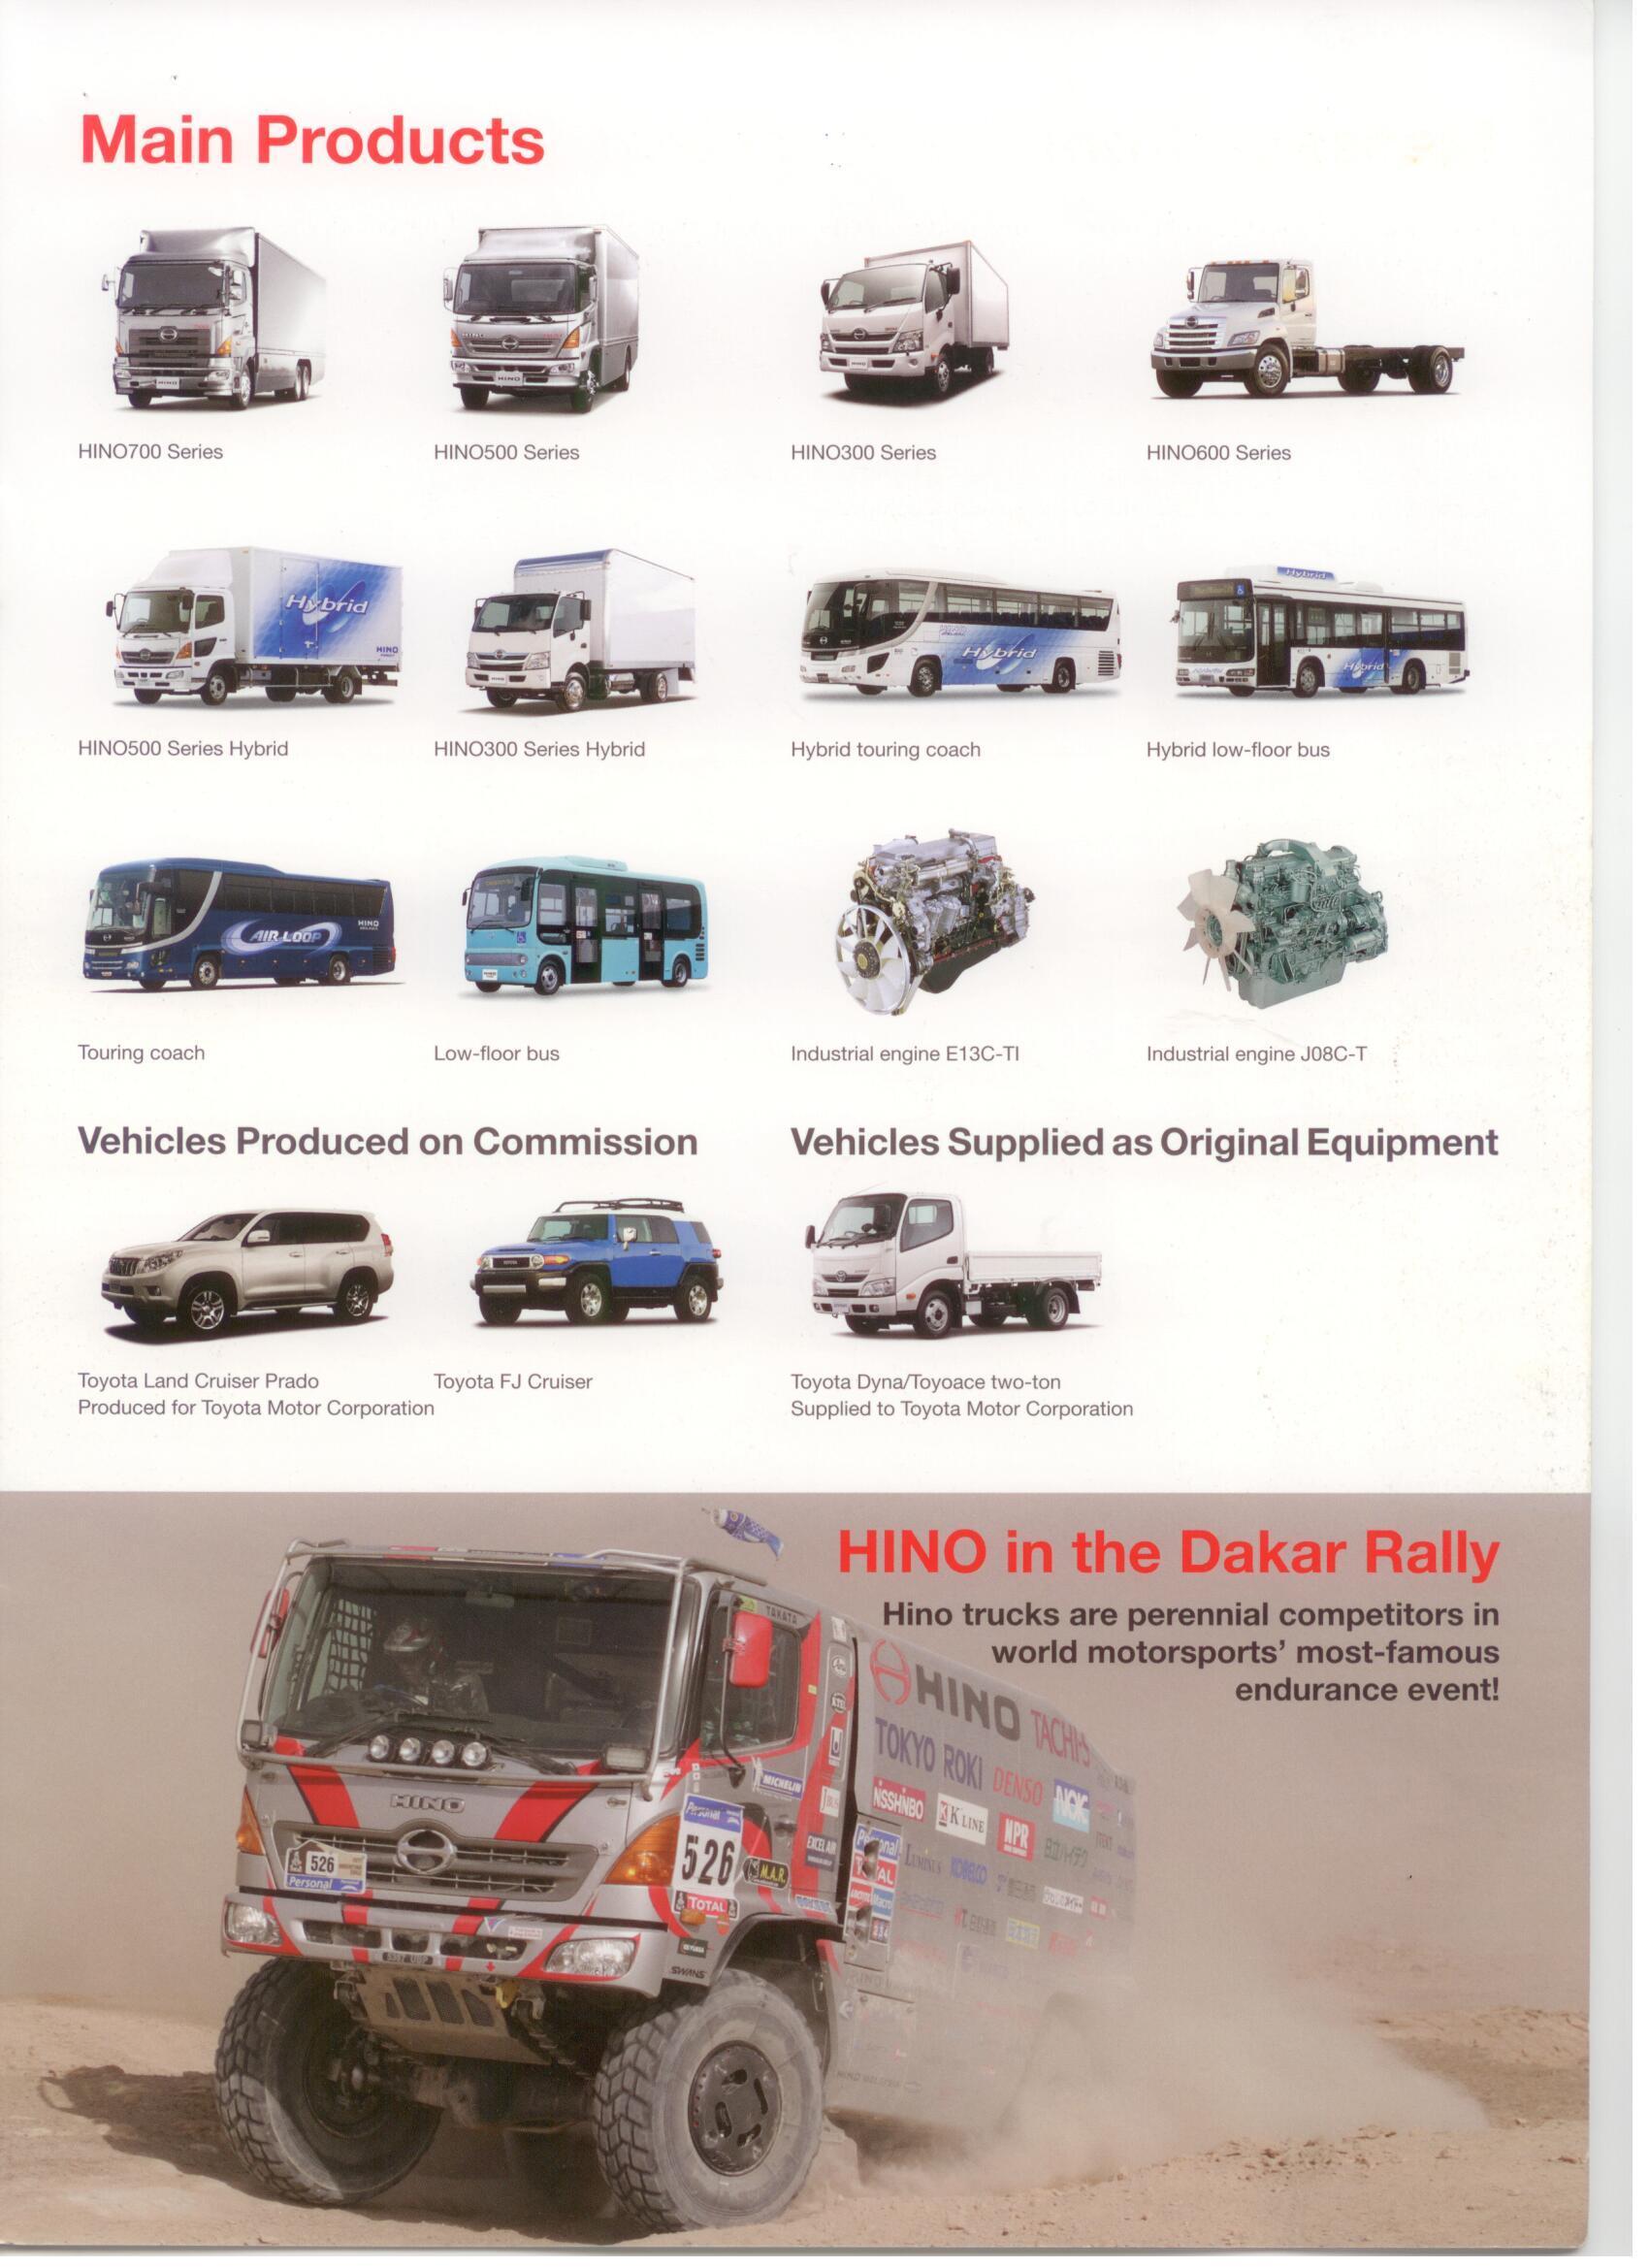 Al Futtaim Motors - Hino - Truck Dealers - Sharjah Industrial Area - Sharjah | citysearch.ae